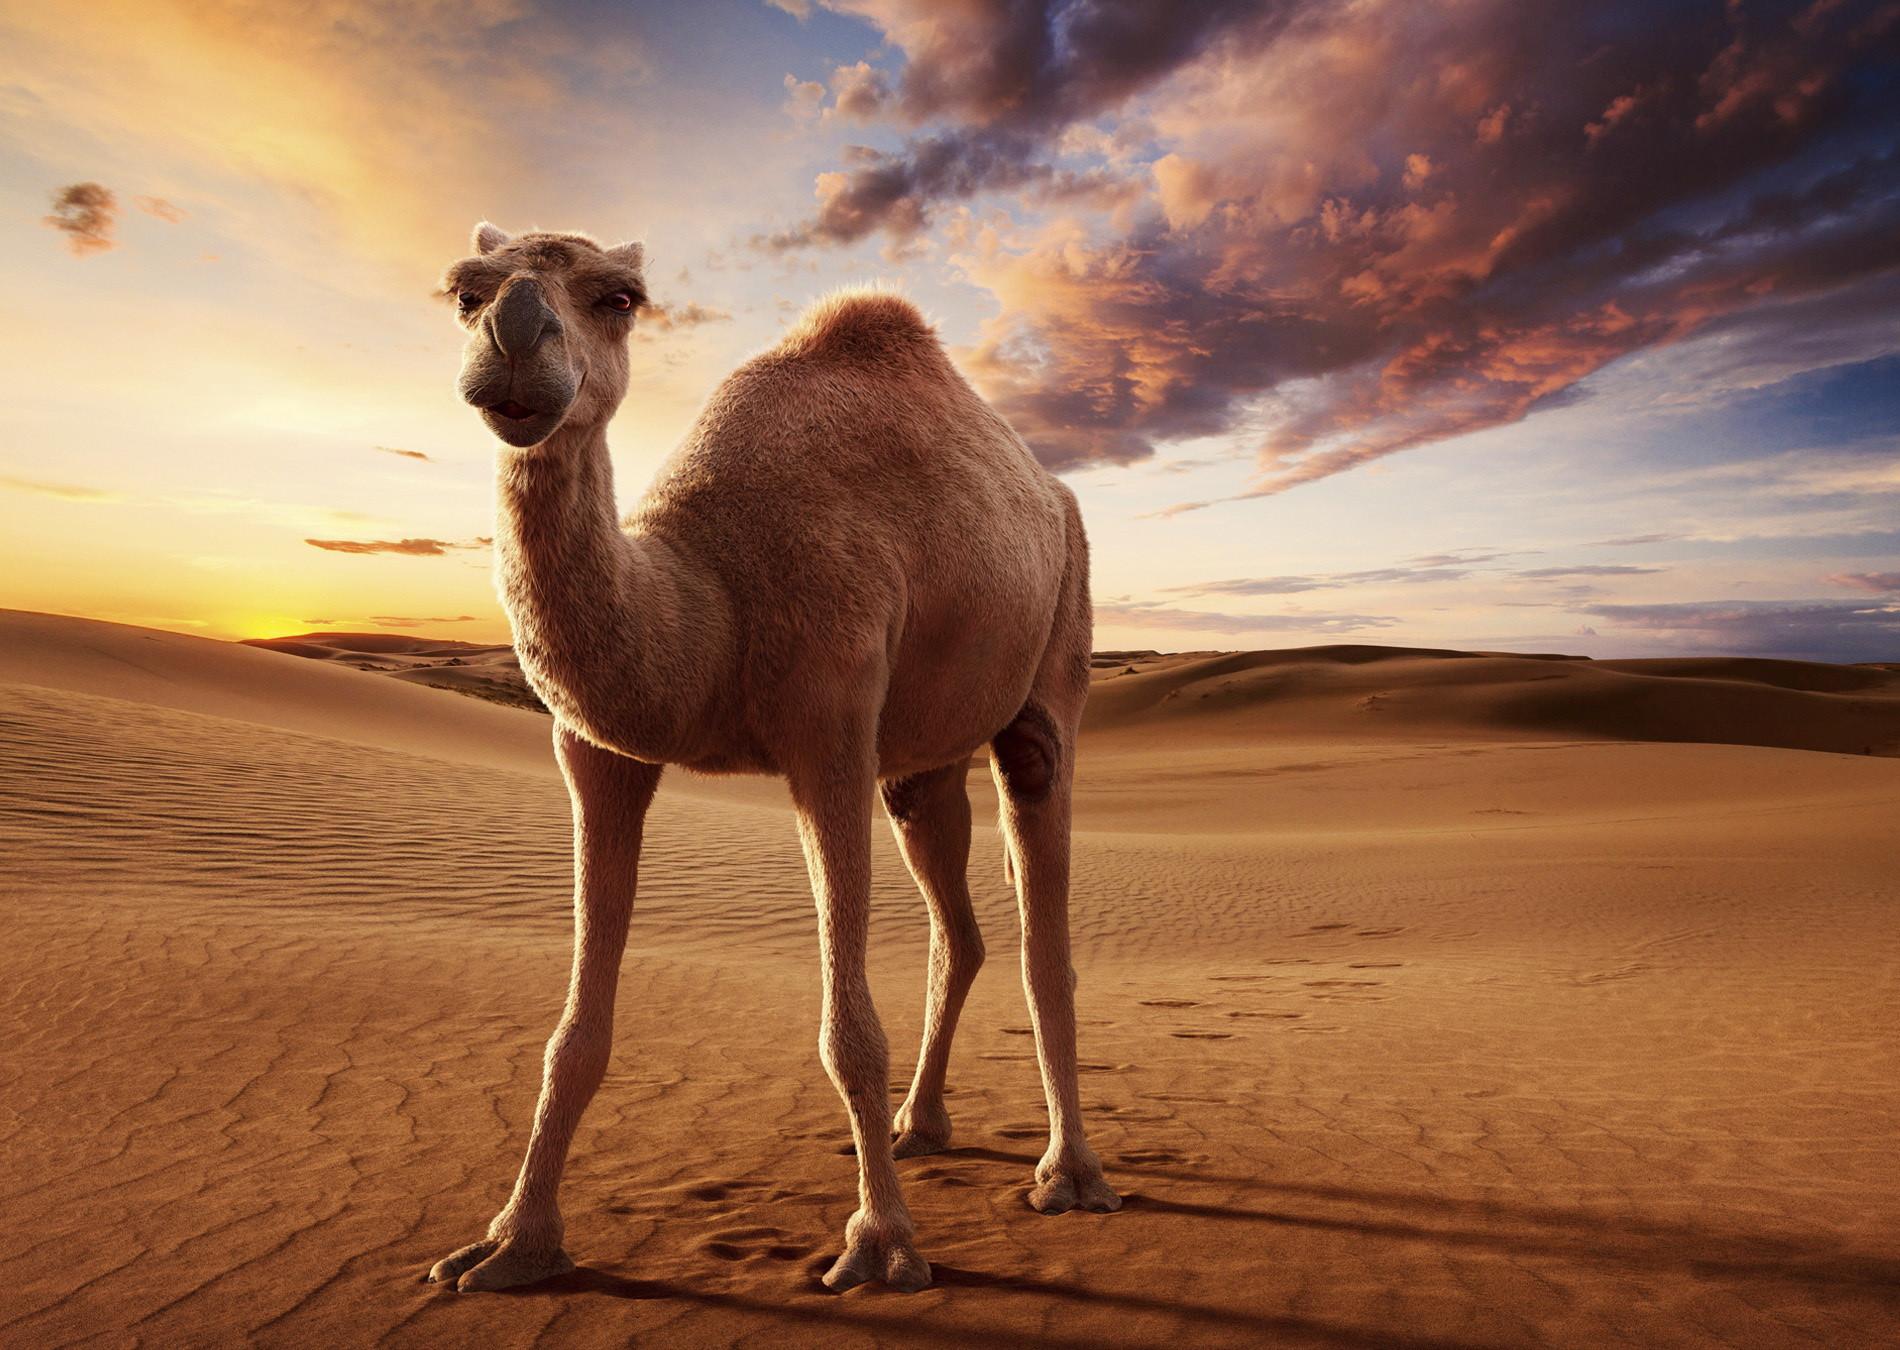 cgi camel and desert landscape boom cgi